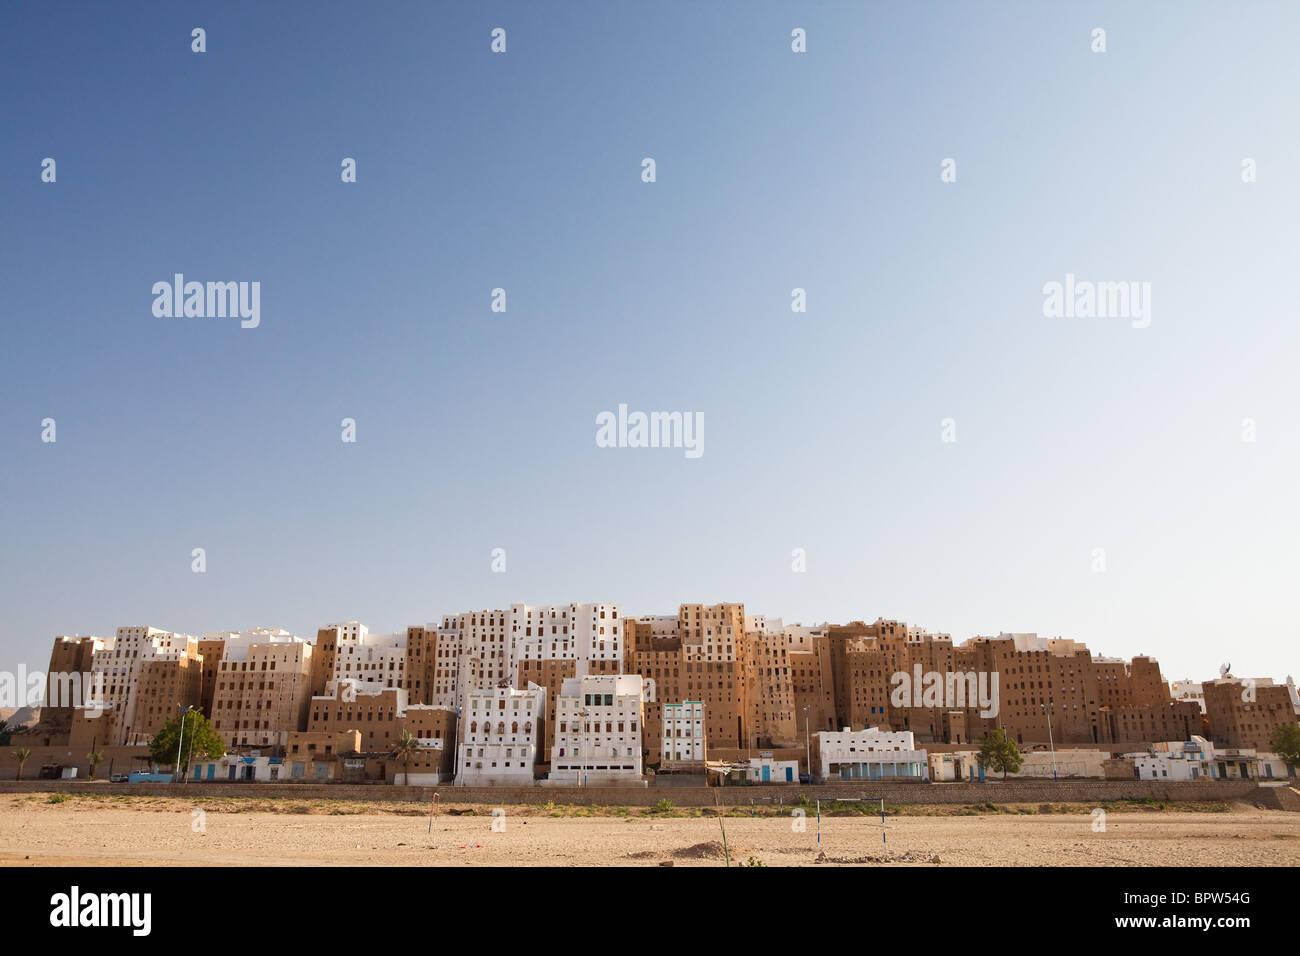 Shibam, Wadi Hadramaut, Yemen - Stock Image